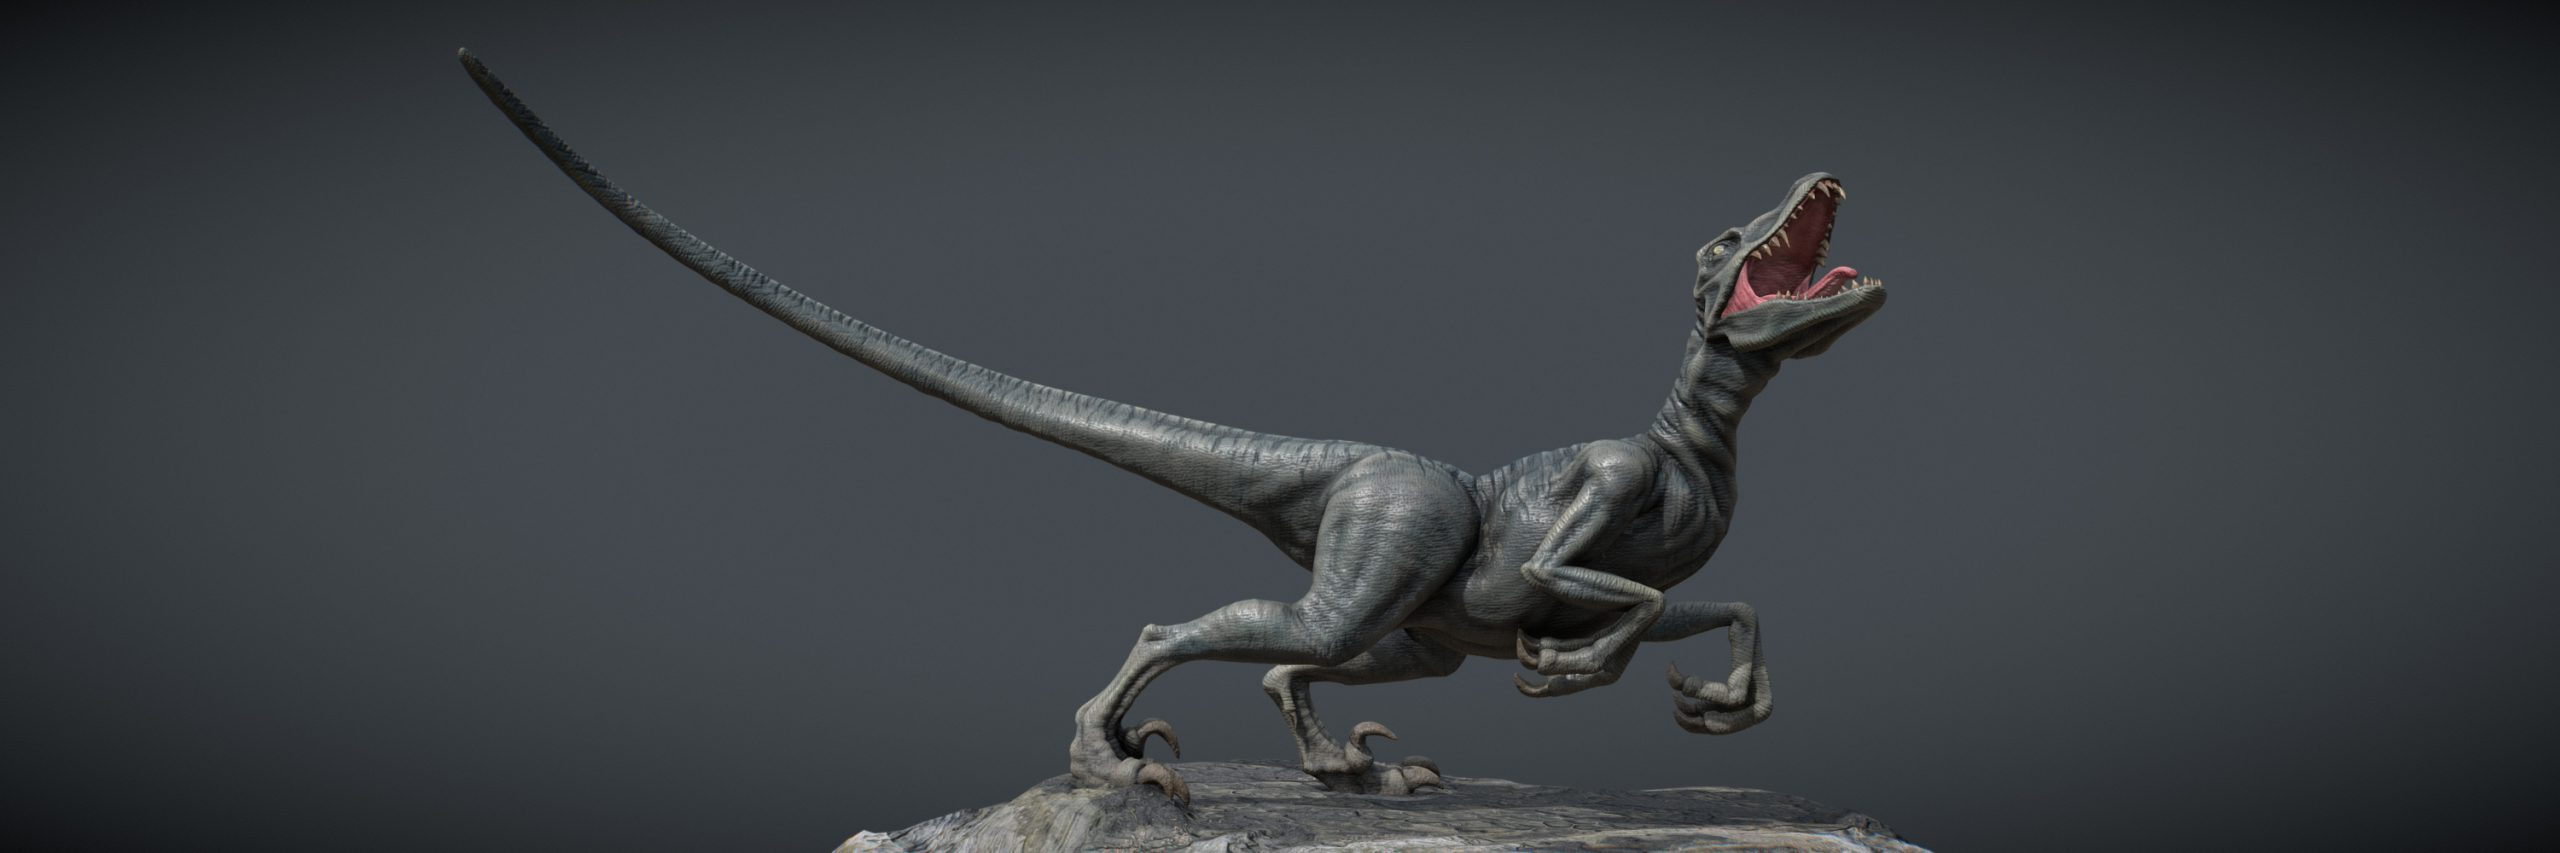 velociraptor header image